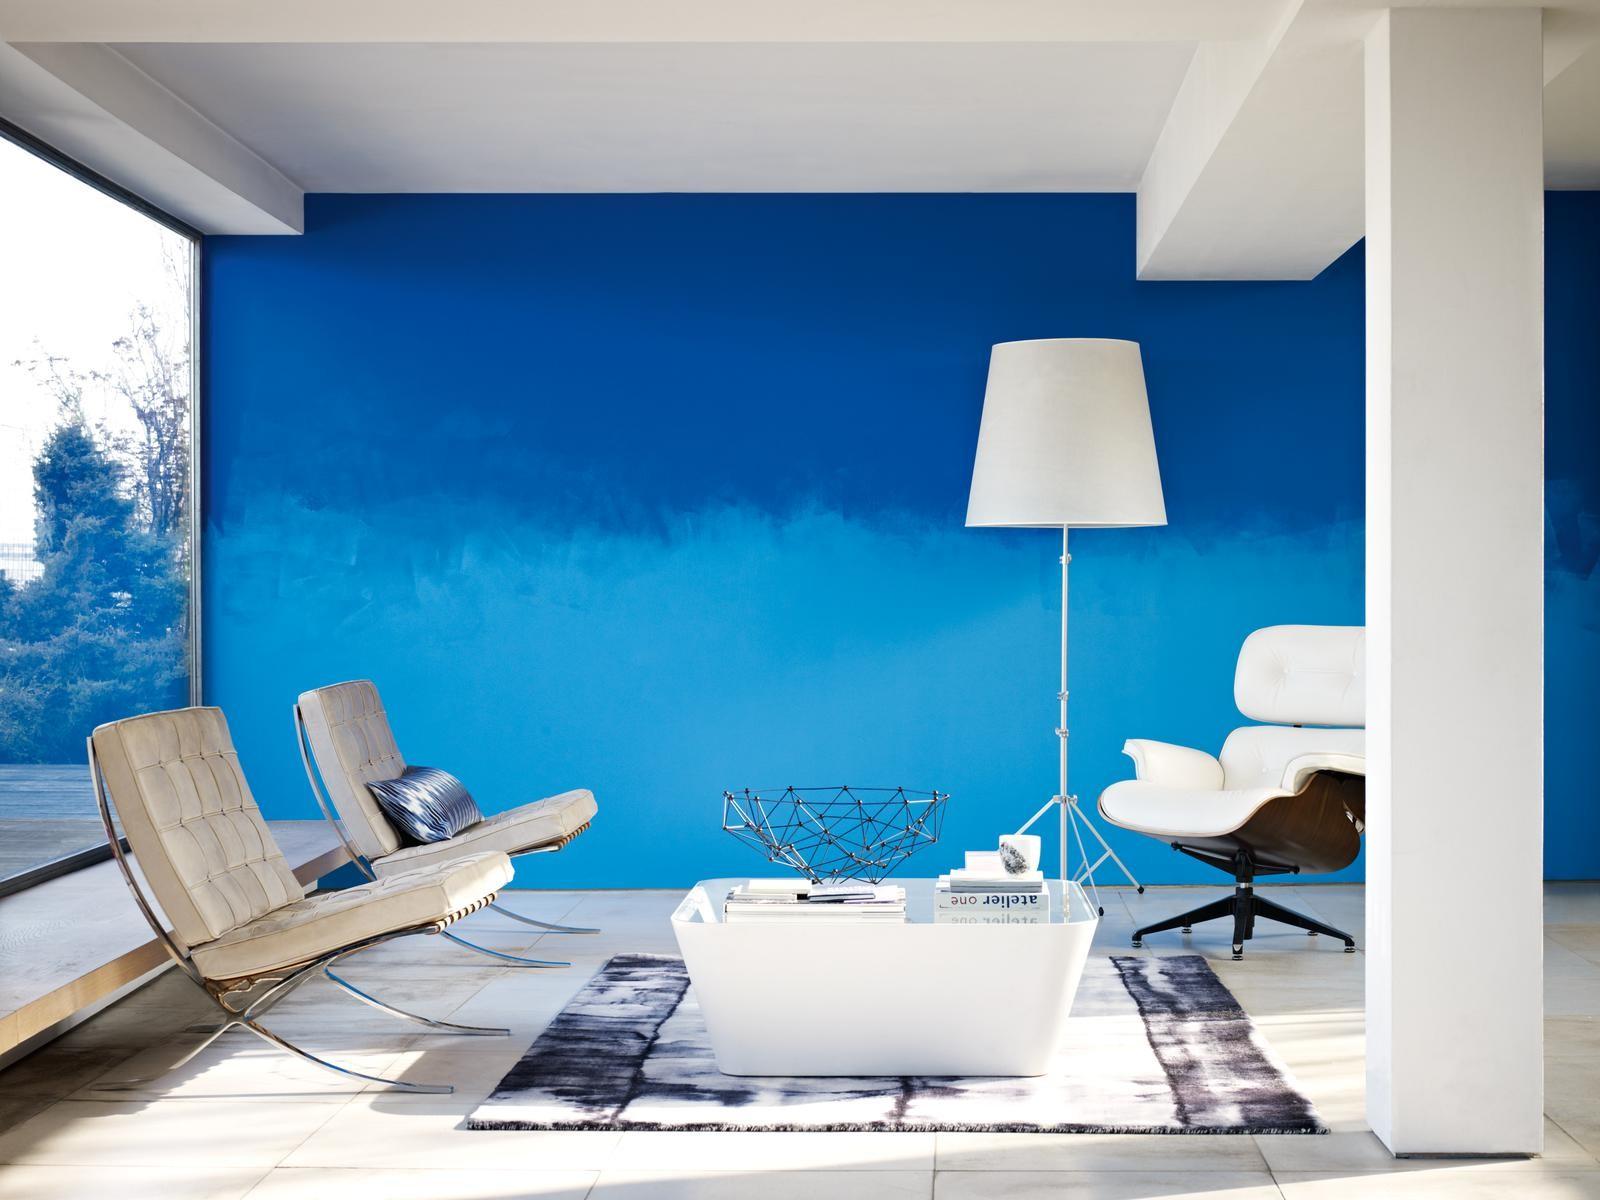 Vardagsrum nordsj id design for Dulux paint room ideas